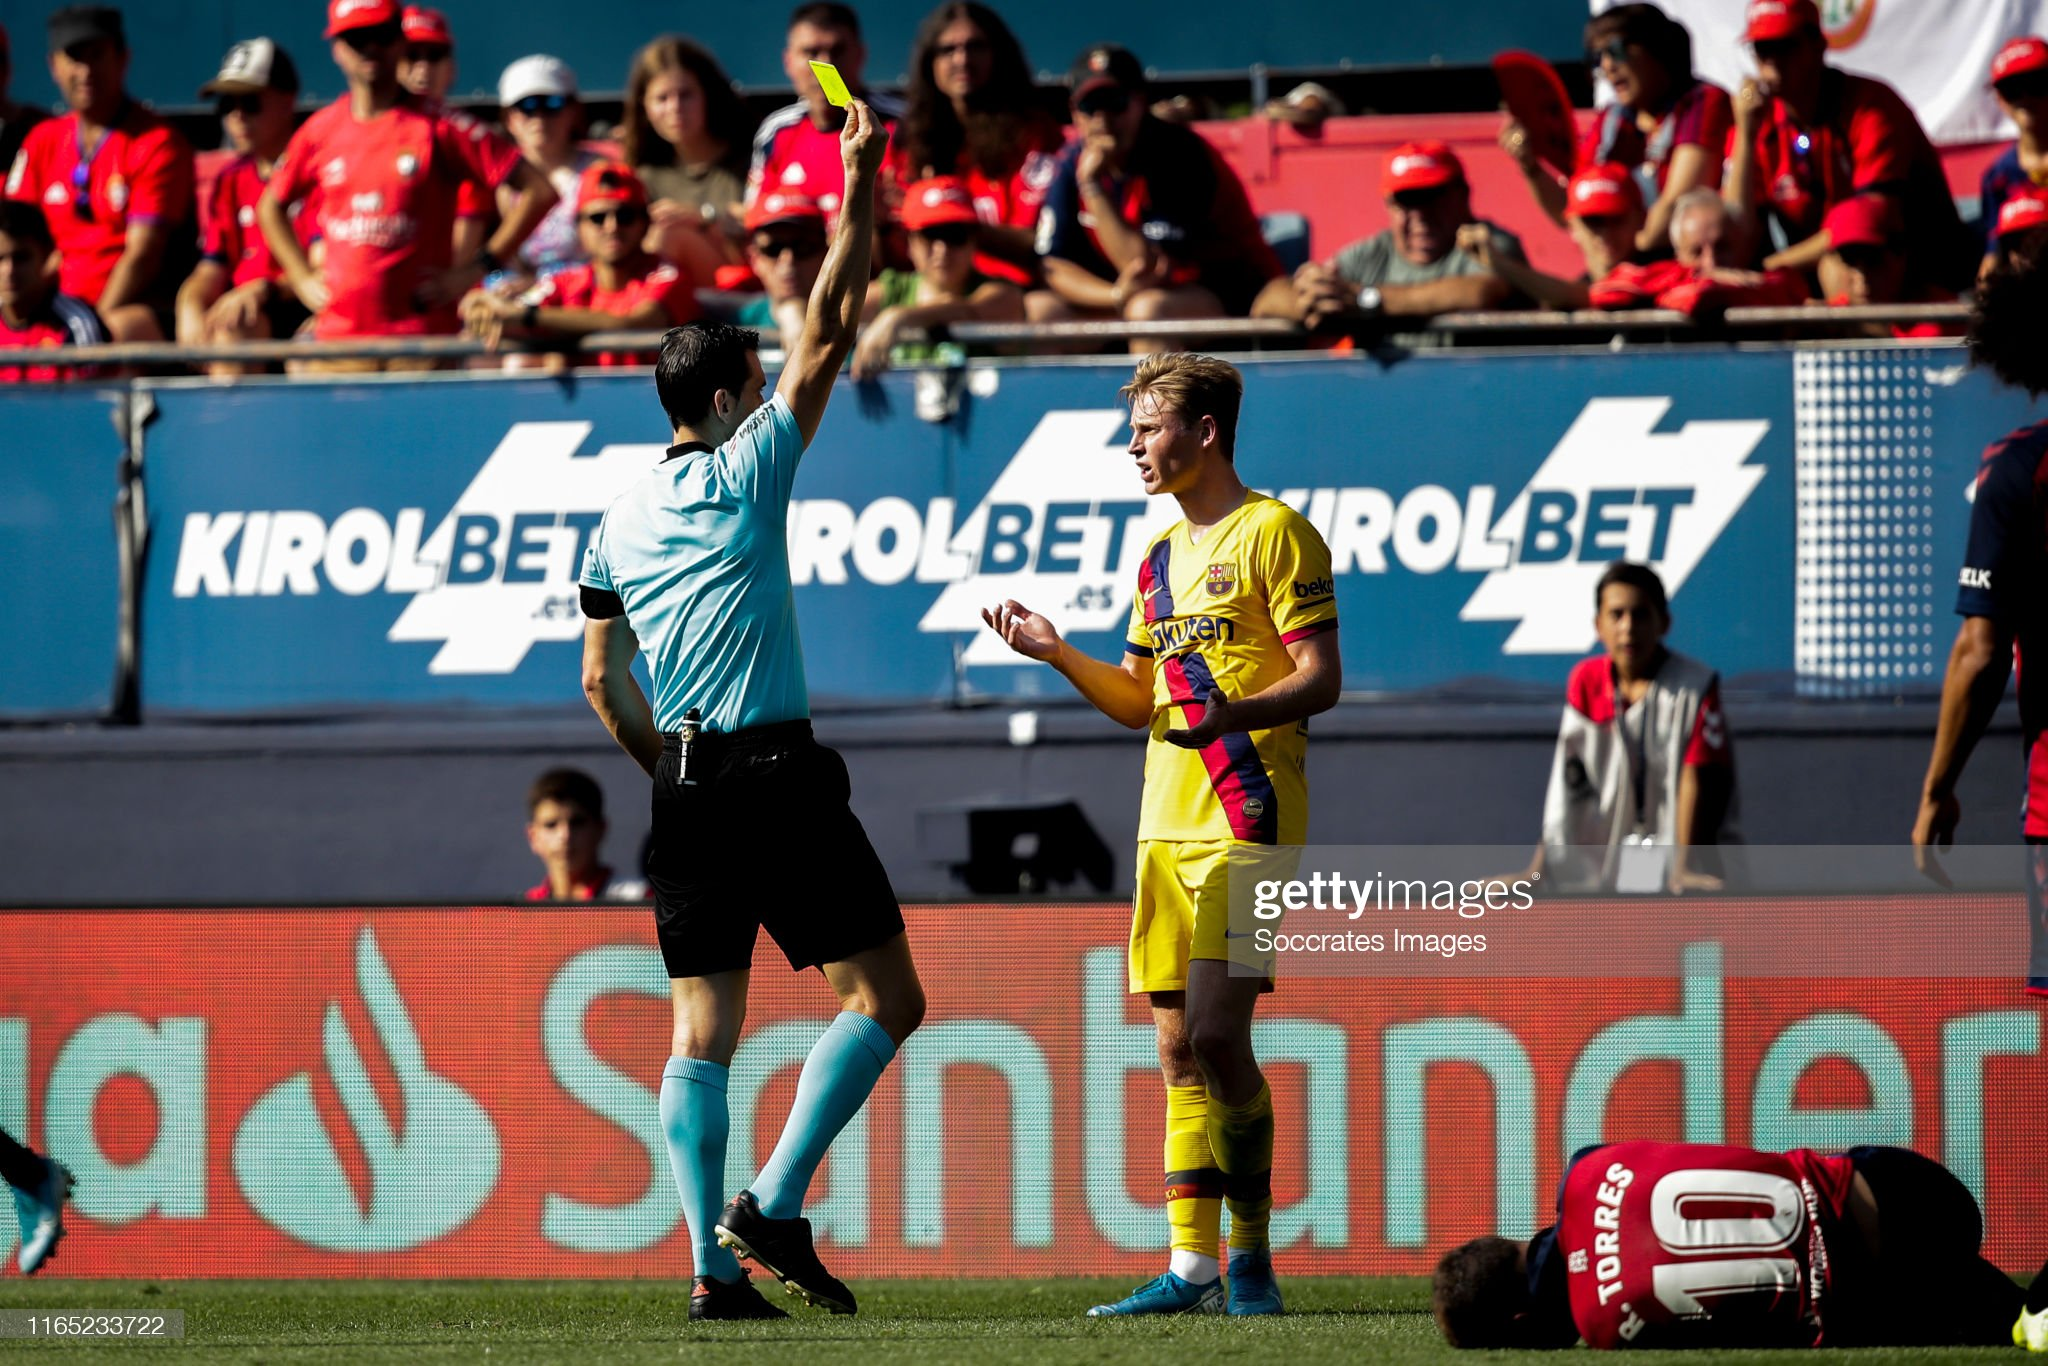 صور مباراة : أوساسونا - برشلونة 2-2 ( 31-08-2019 )  Referee-martinez-munuera-frenkie-de-jong-of-fc-barcelona-torres-of-ca-picture-id1165233722?s=2048x2048